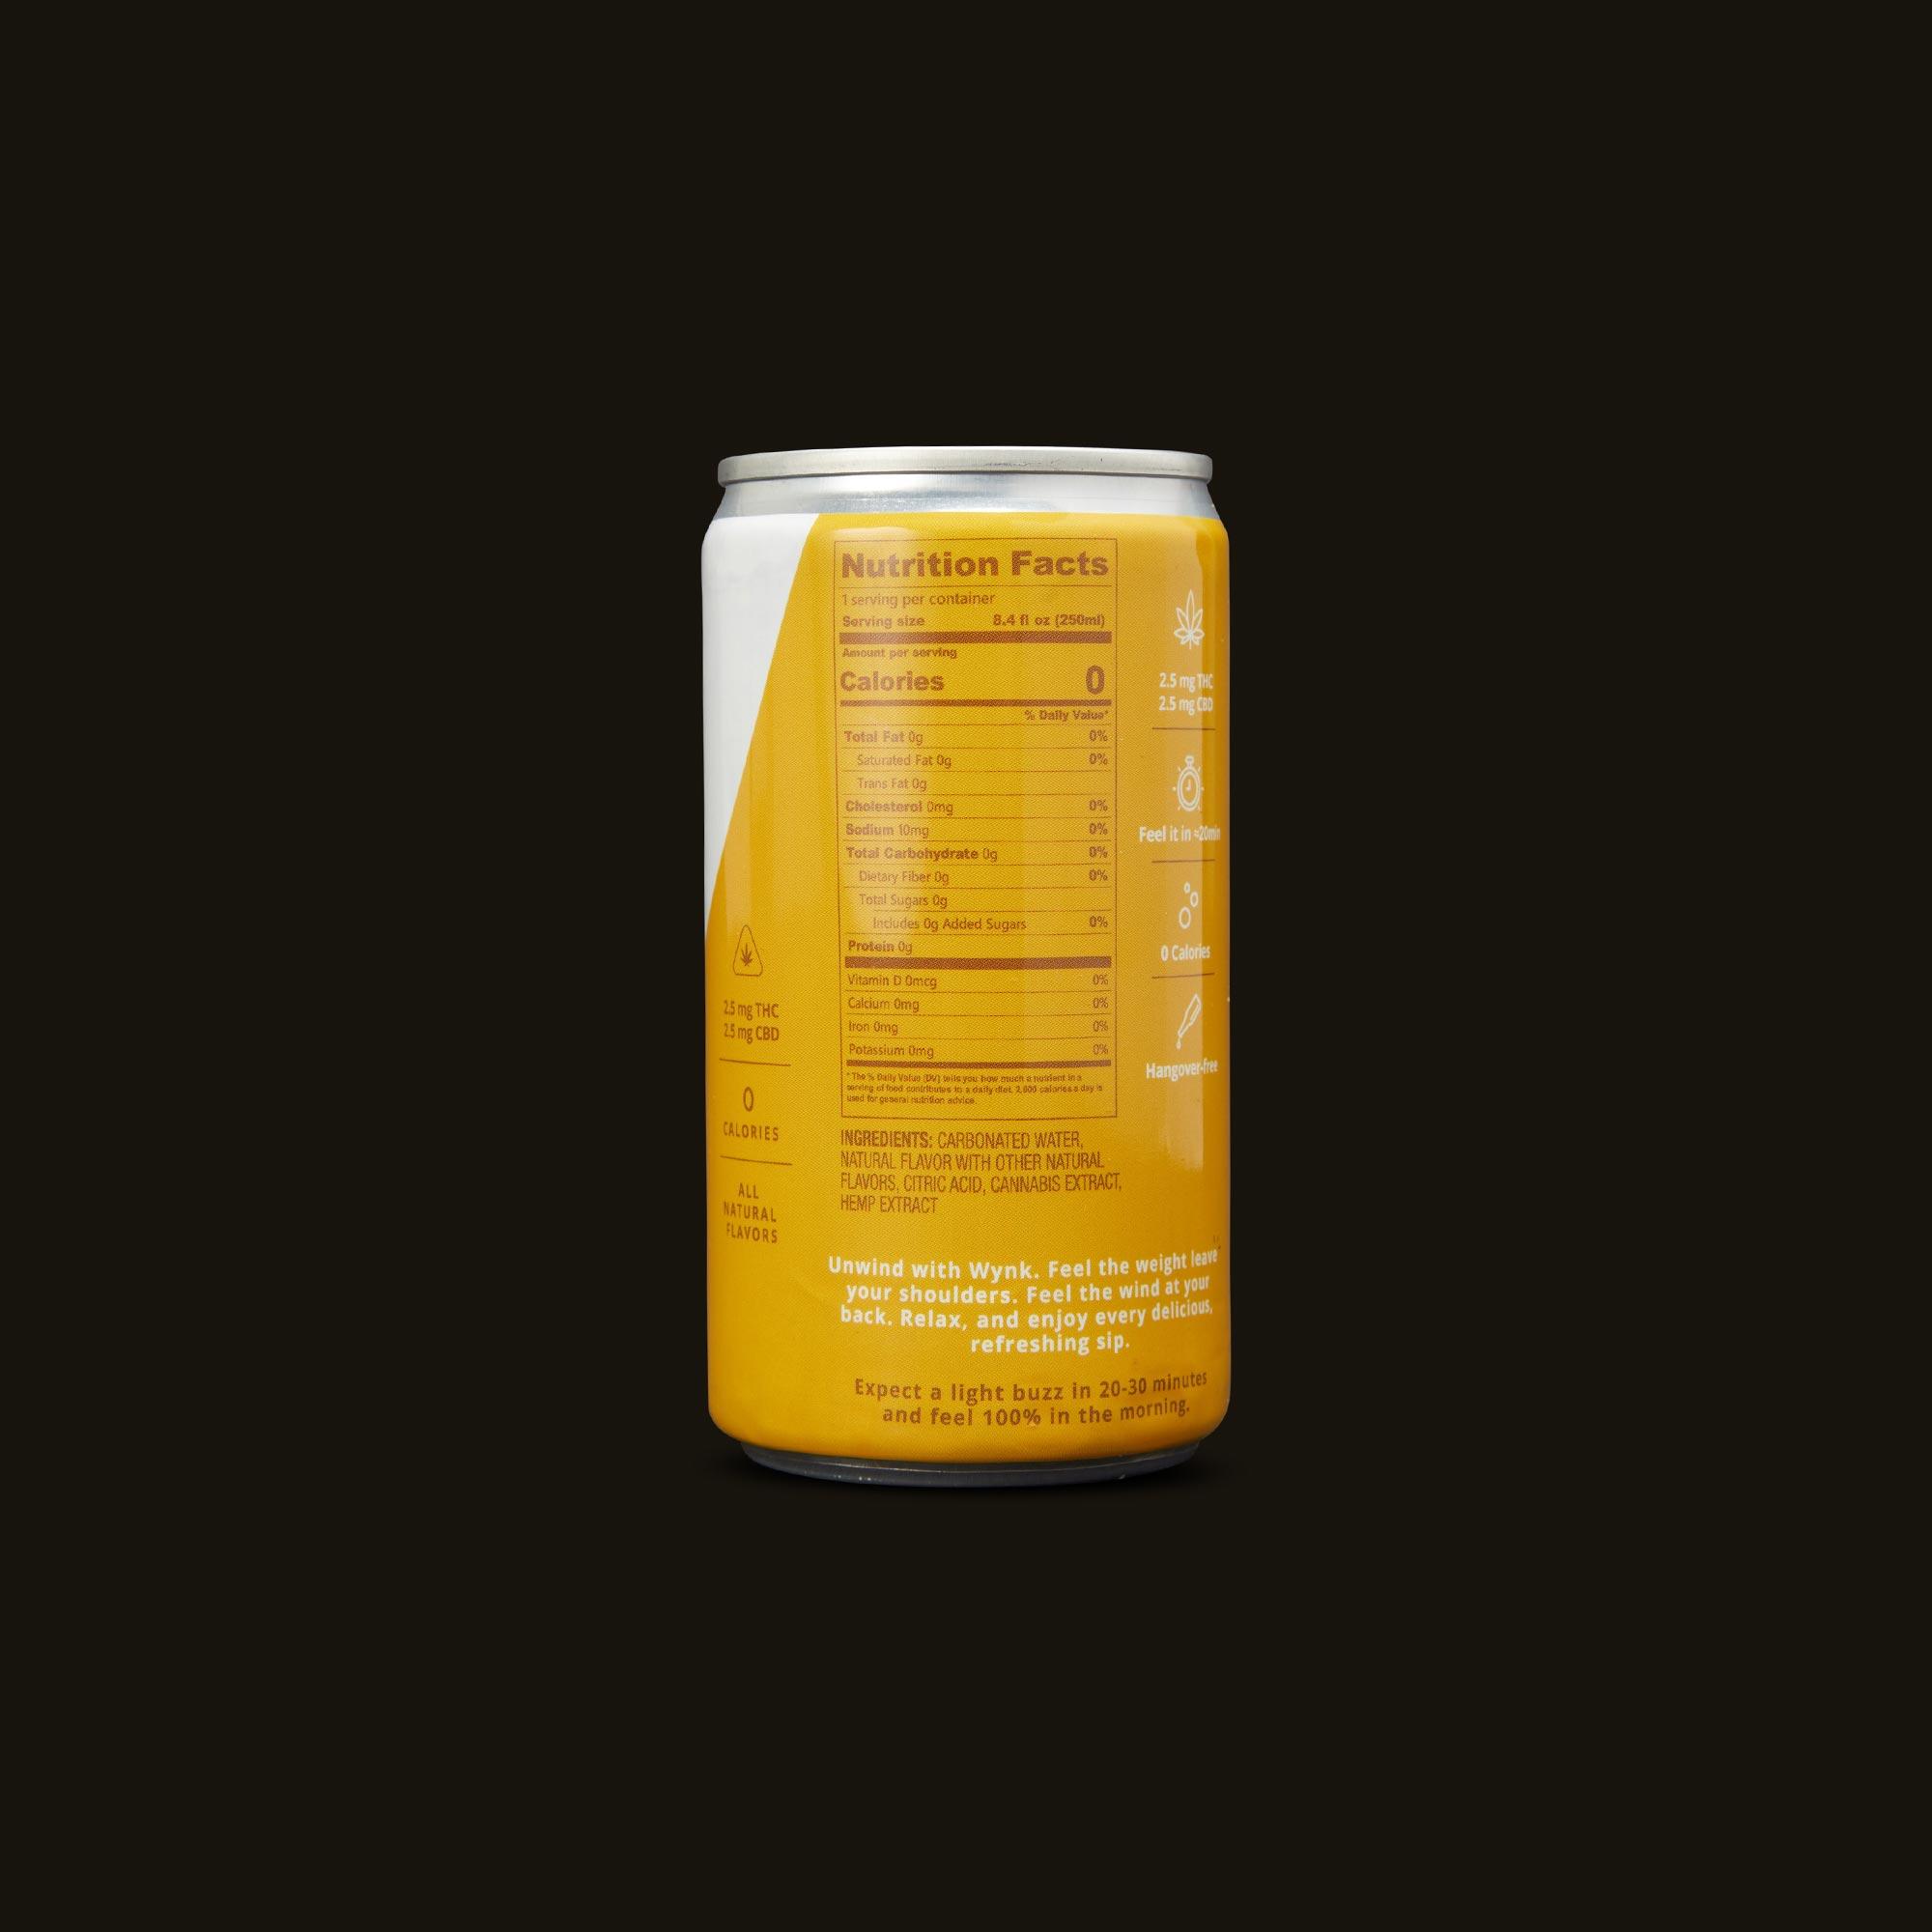 Wynk Beverage - Juicy Mango Seltzer